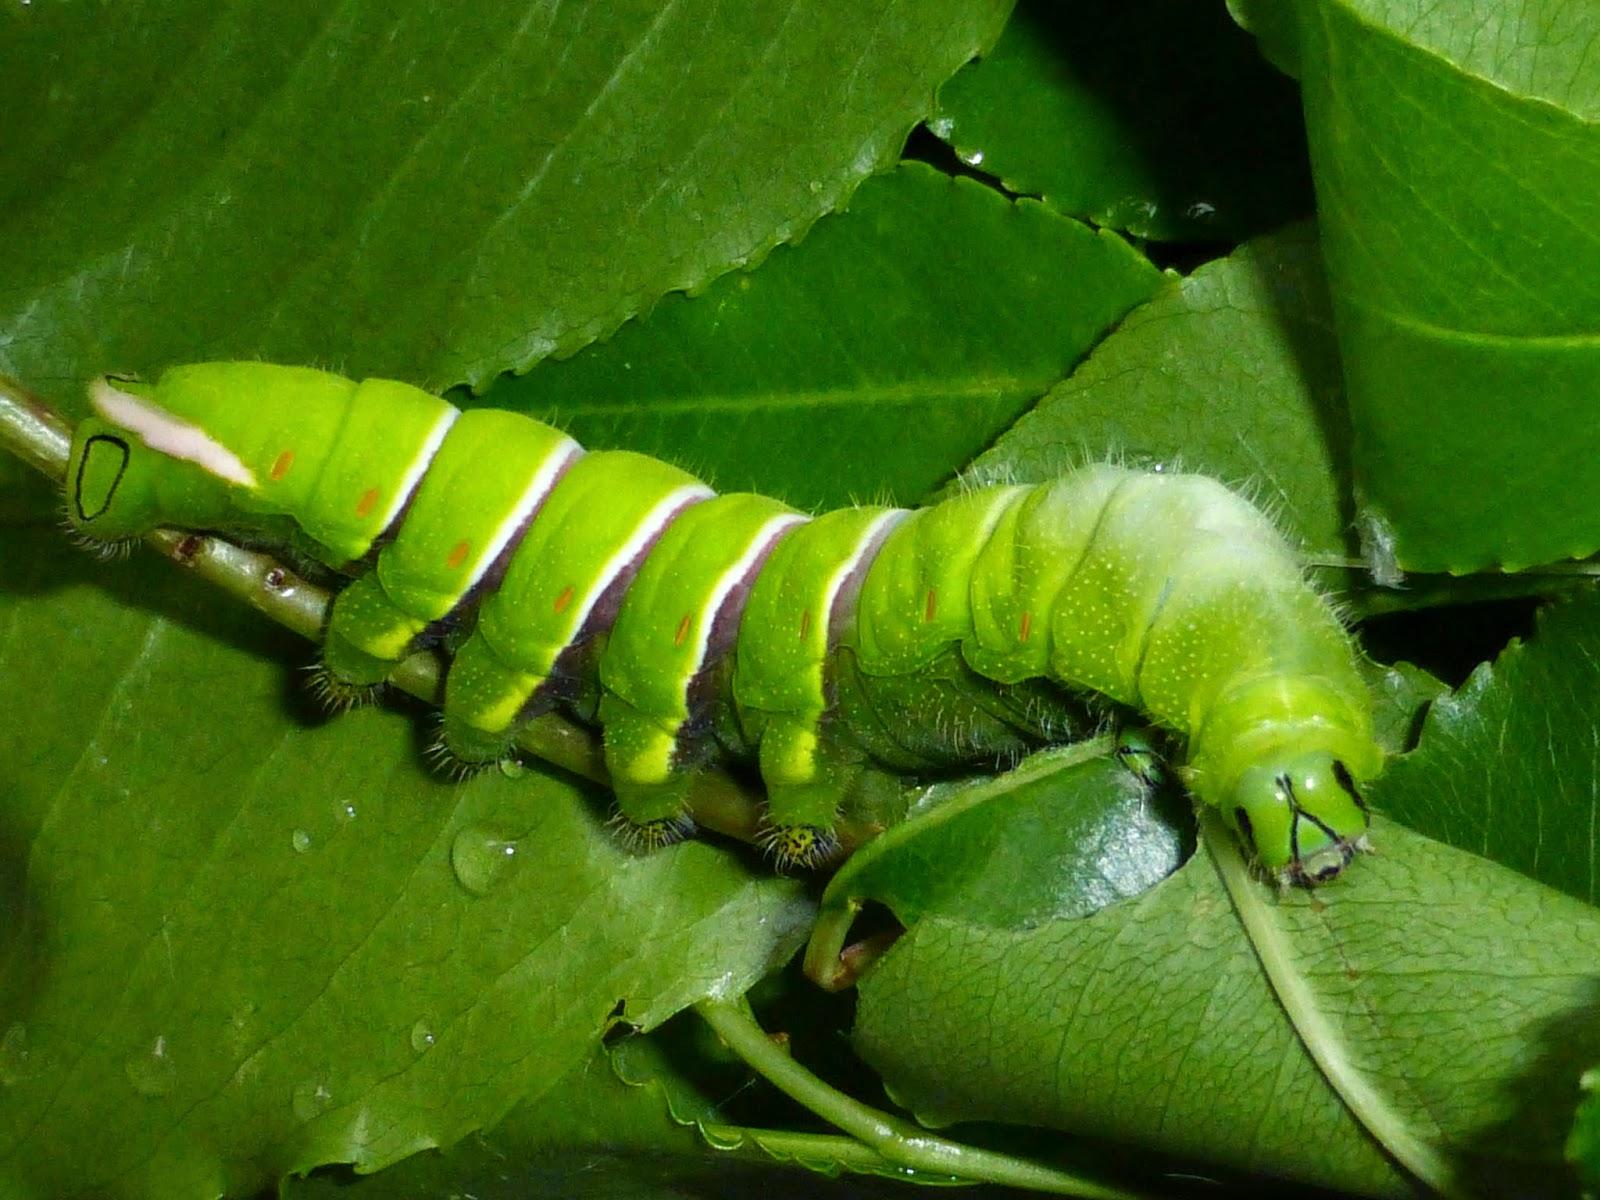 Rothschildia caterpillar